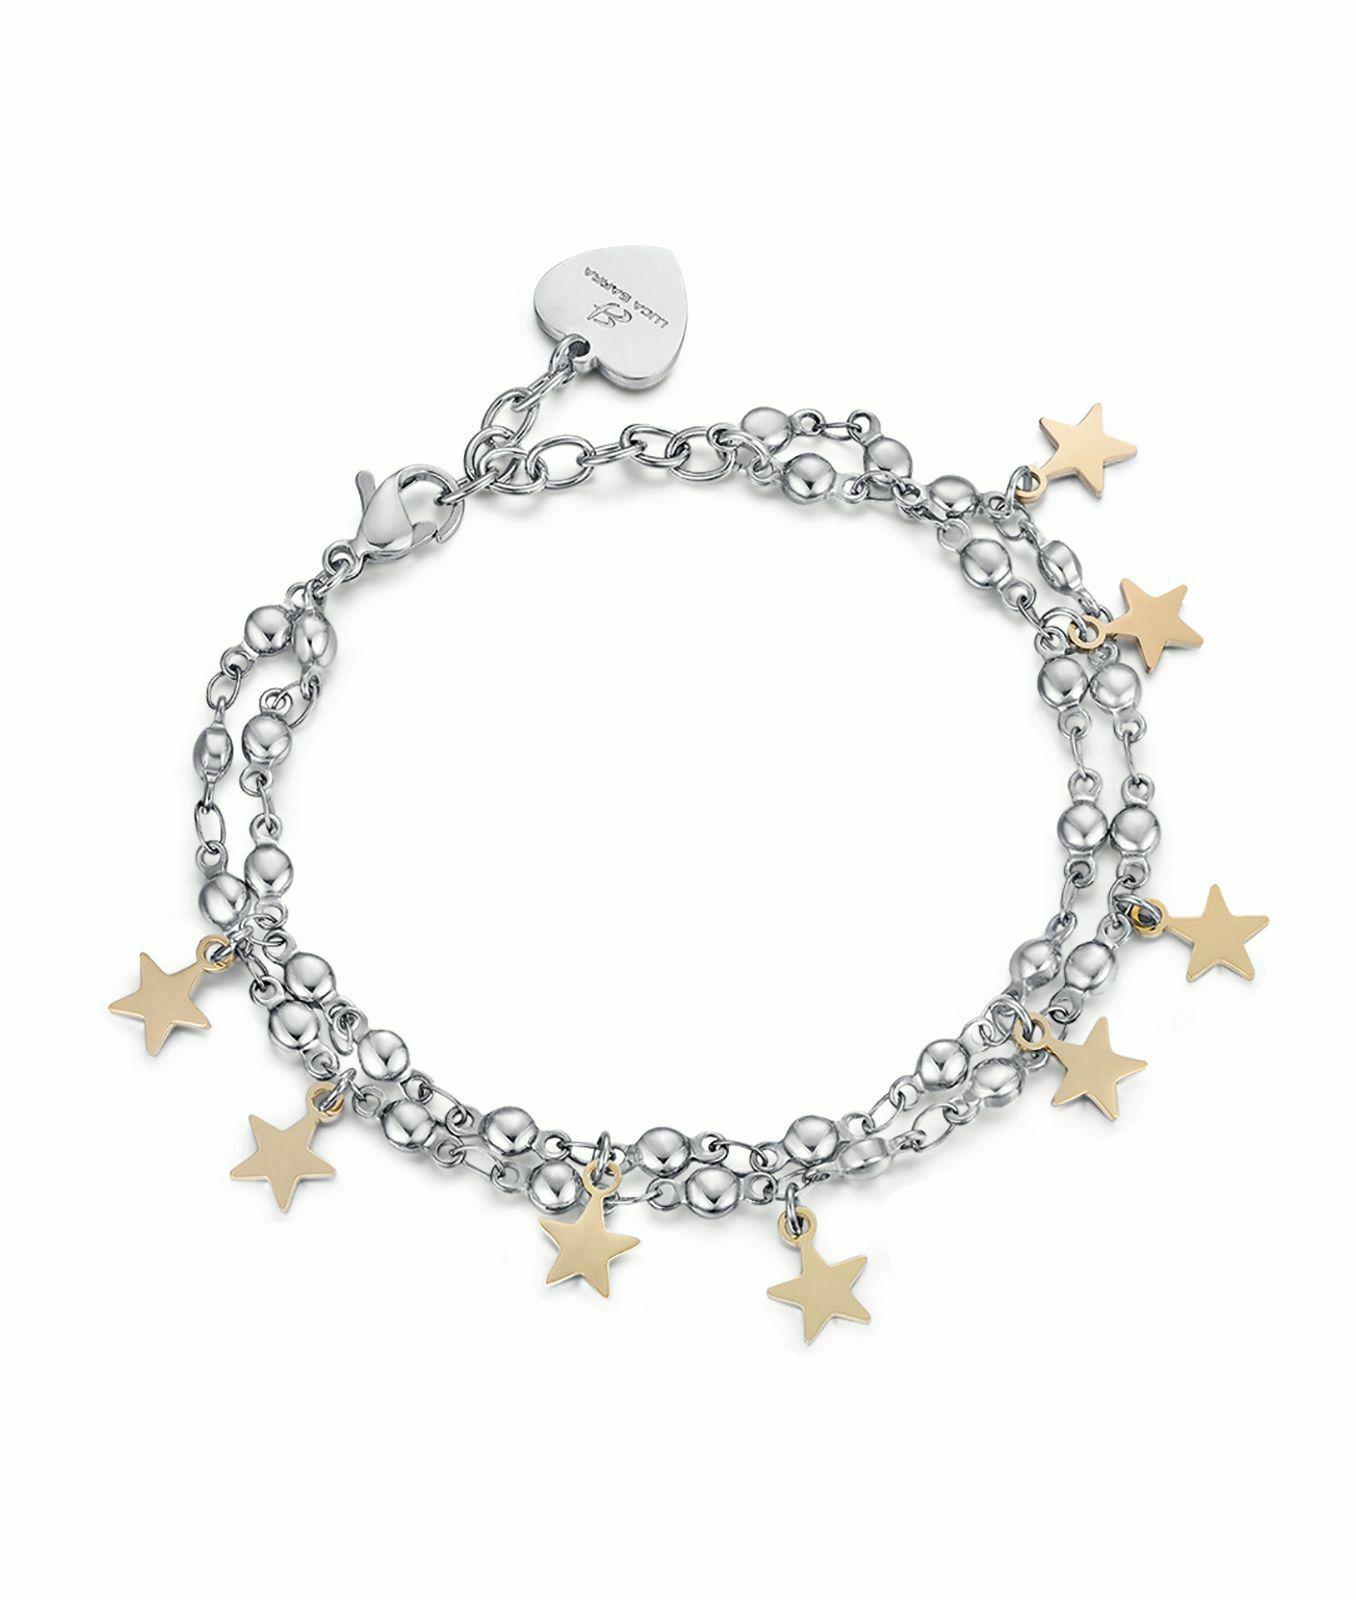 Bracciale donna Luca Barra in acciaio con stelle dorate  BK1843